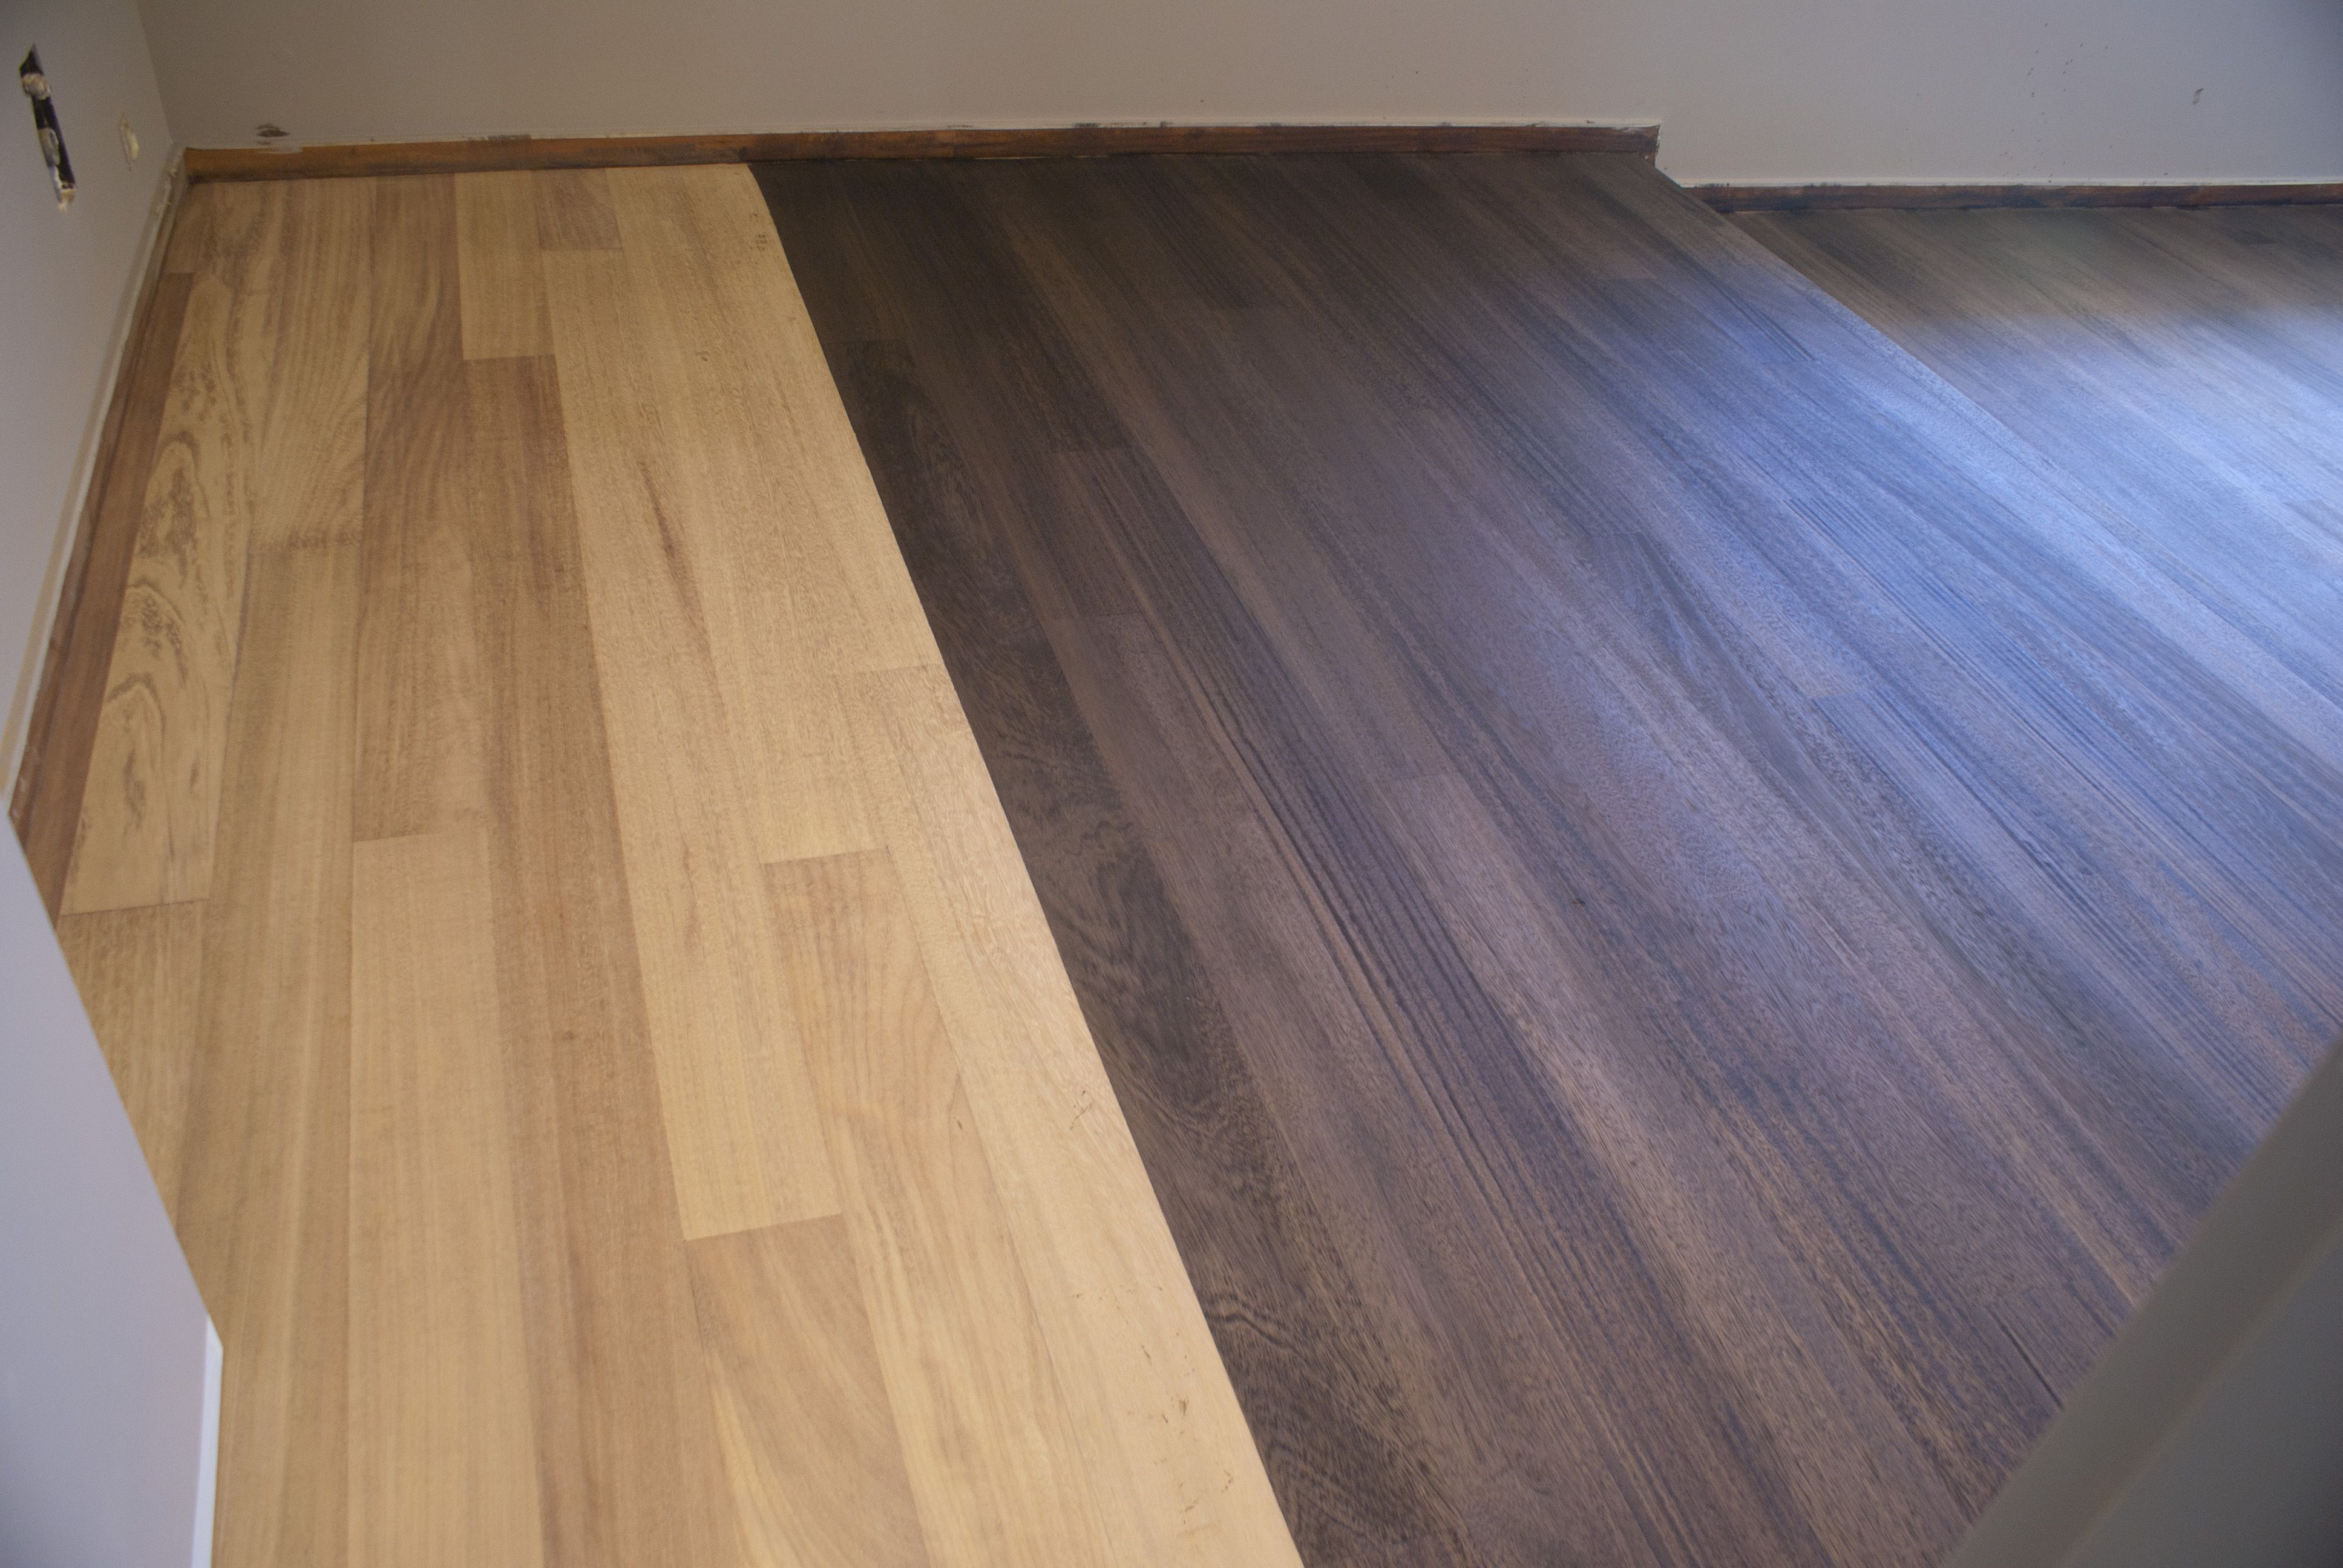 Te ido de tarima de iroko parquet suelos de madera suelos e madera - Piastrelle simili al parquet ...